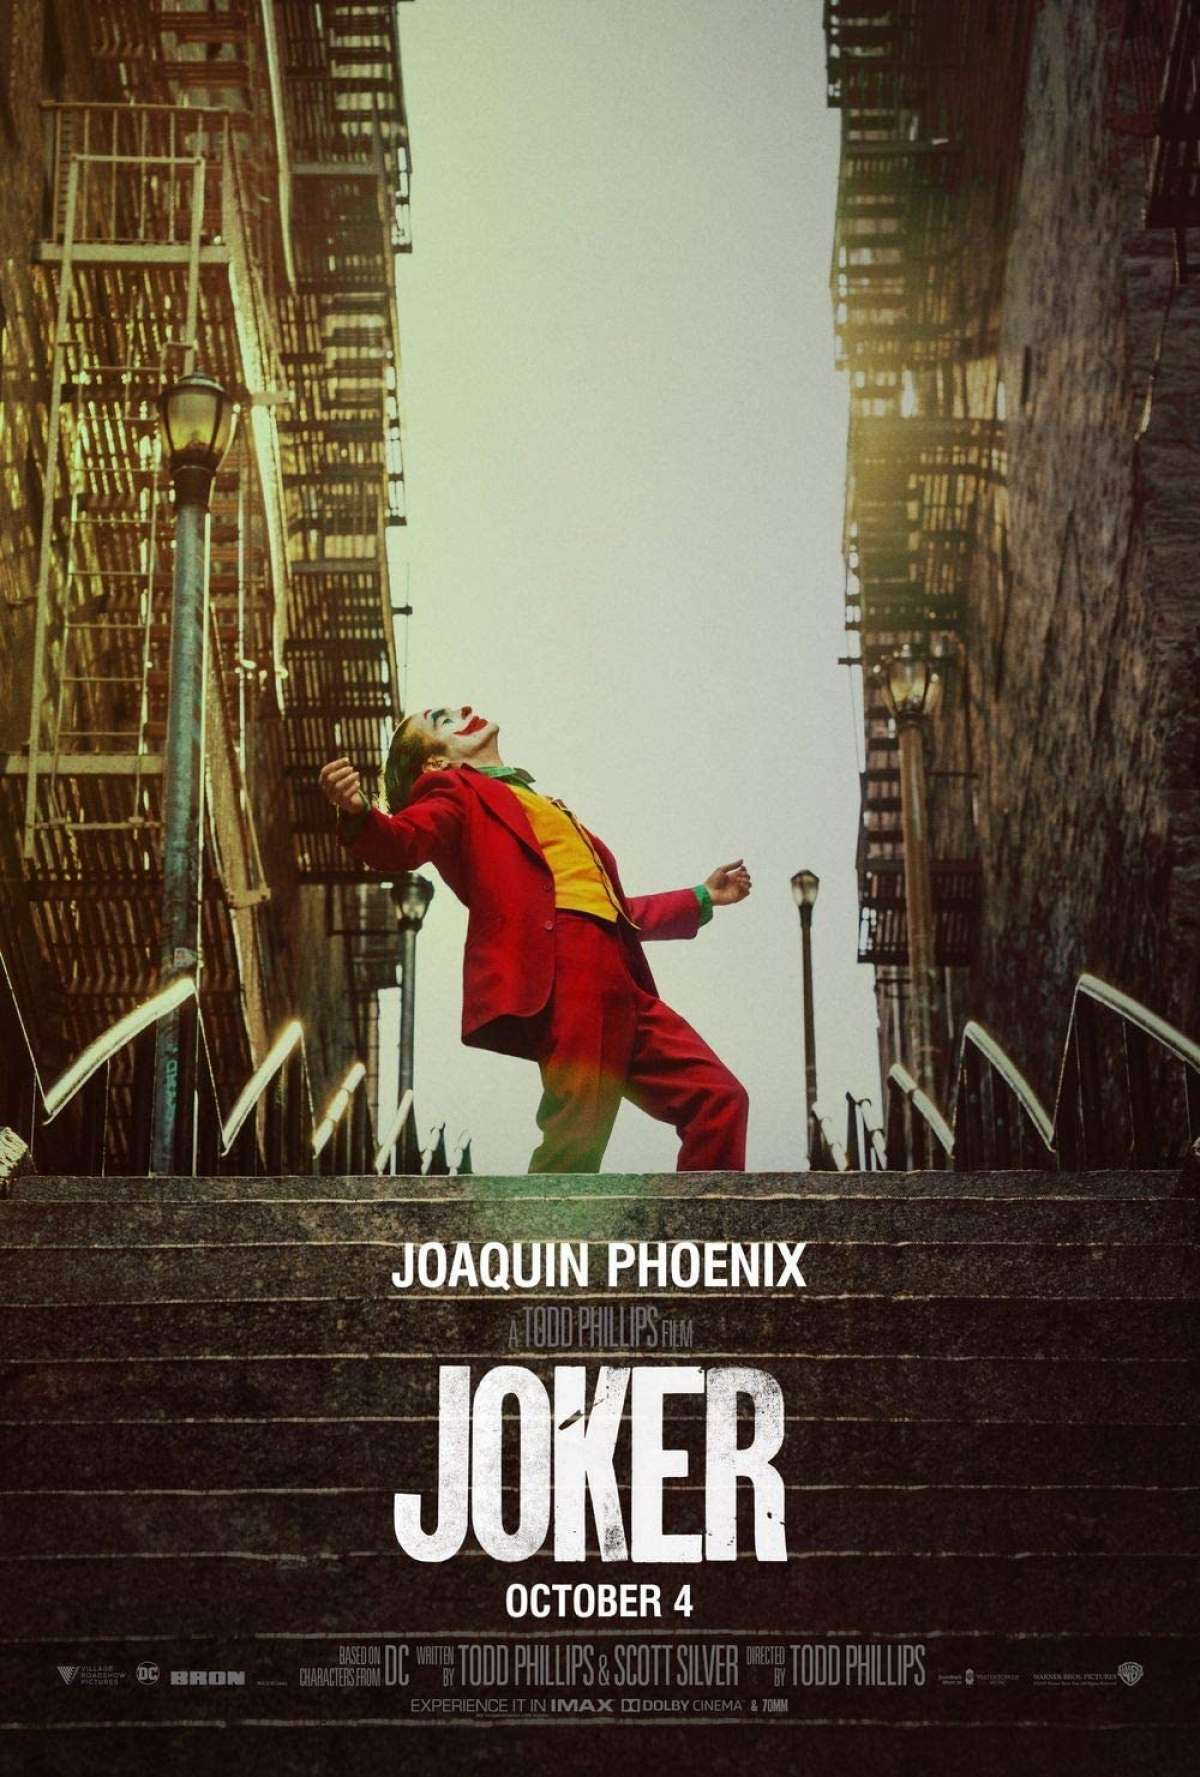 Joker - Autokino  - Open Air Arena - Homberg (Efze)